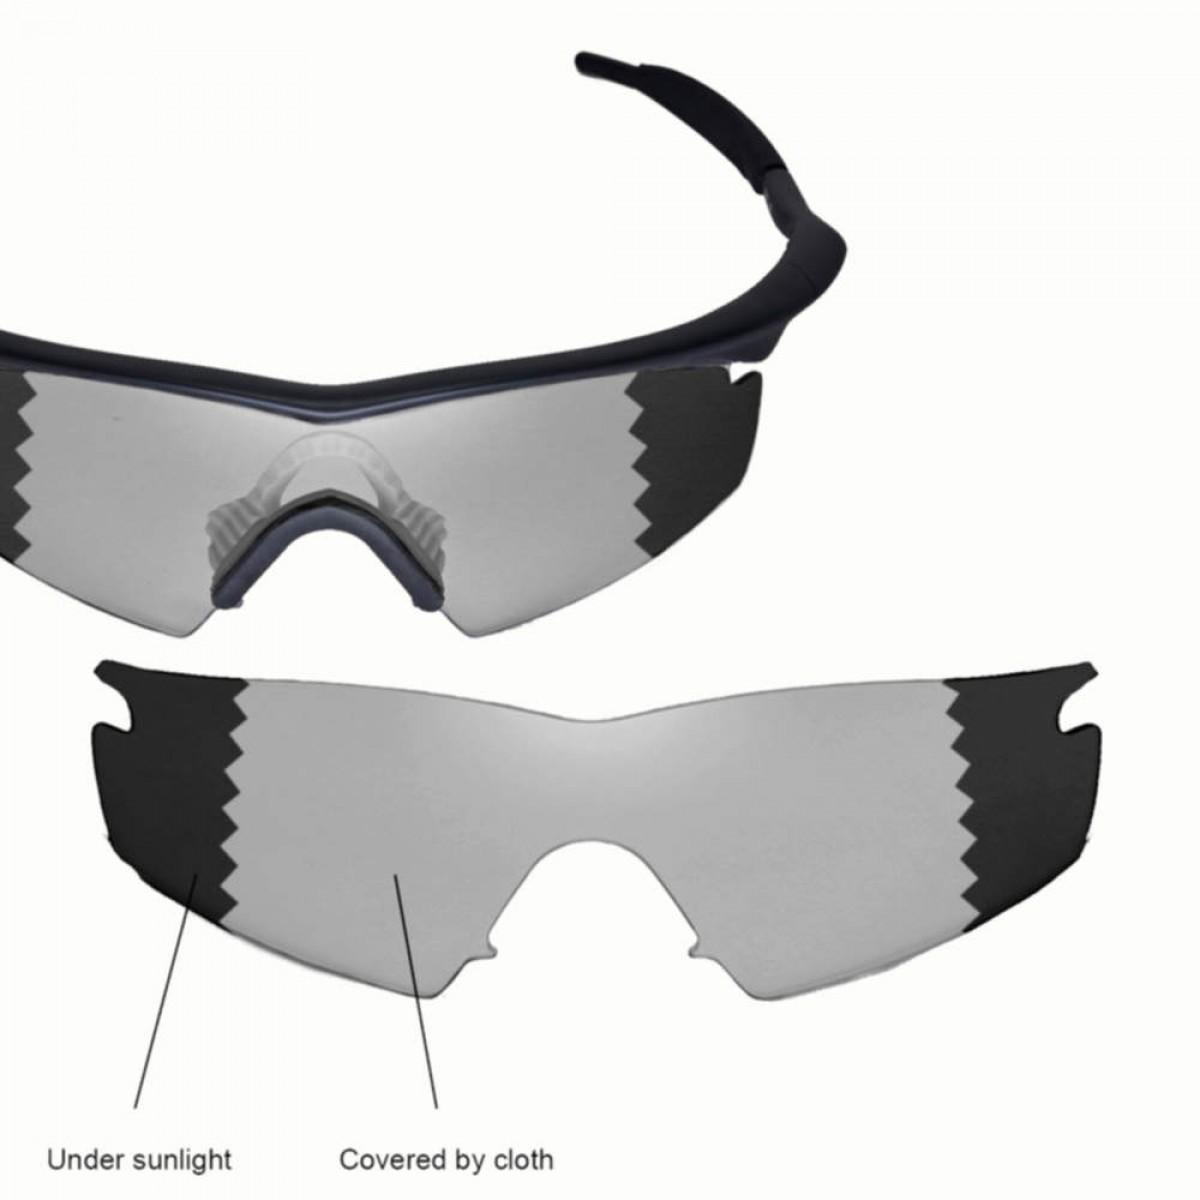 Cofery Lenses Store Cofery Replacement Lenses for Oakley M Frame ...